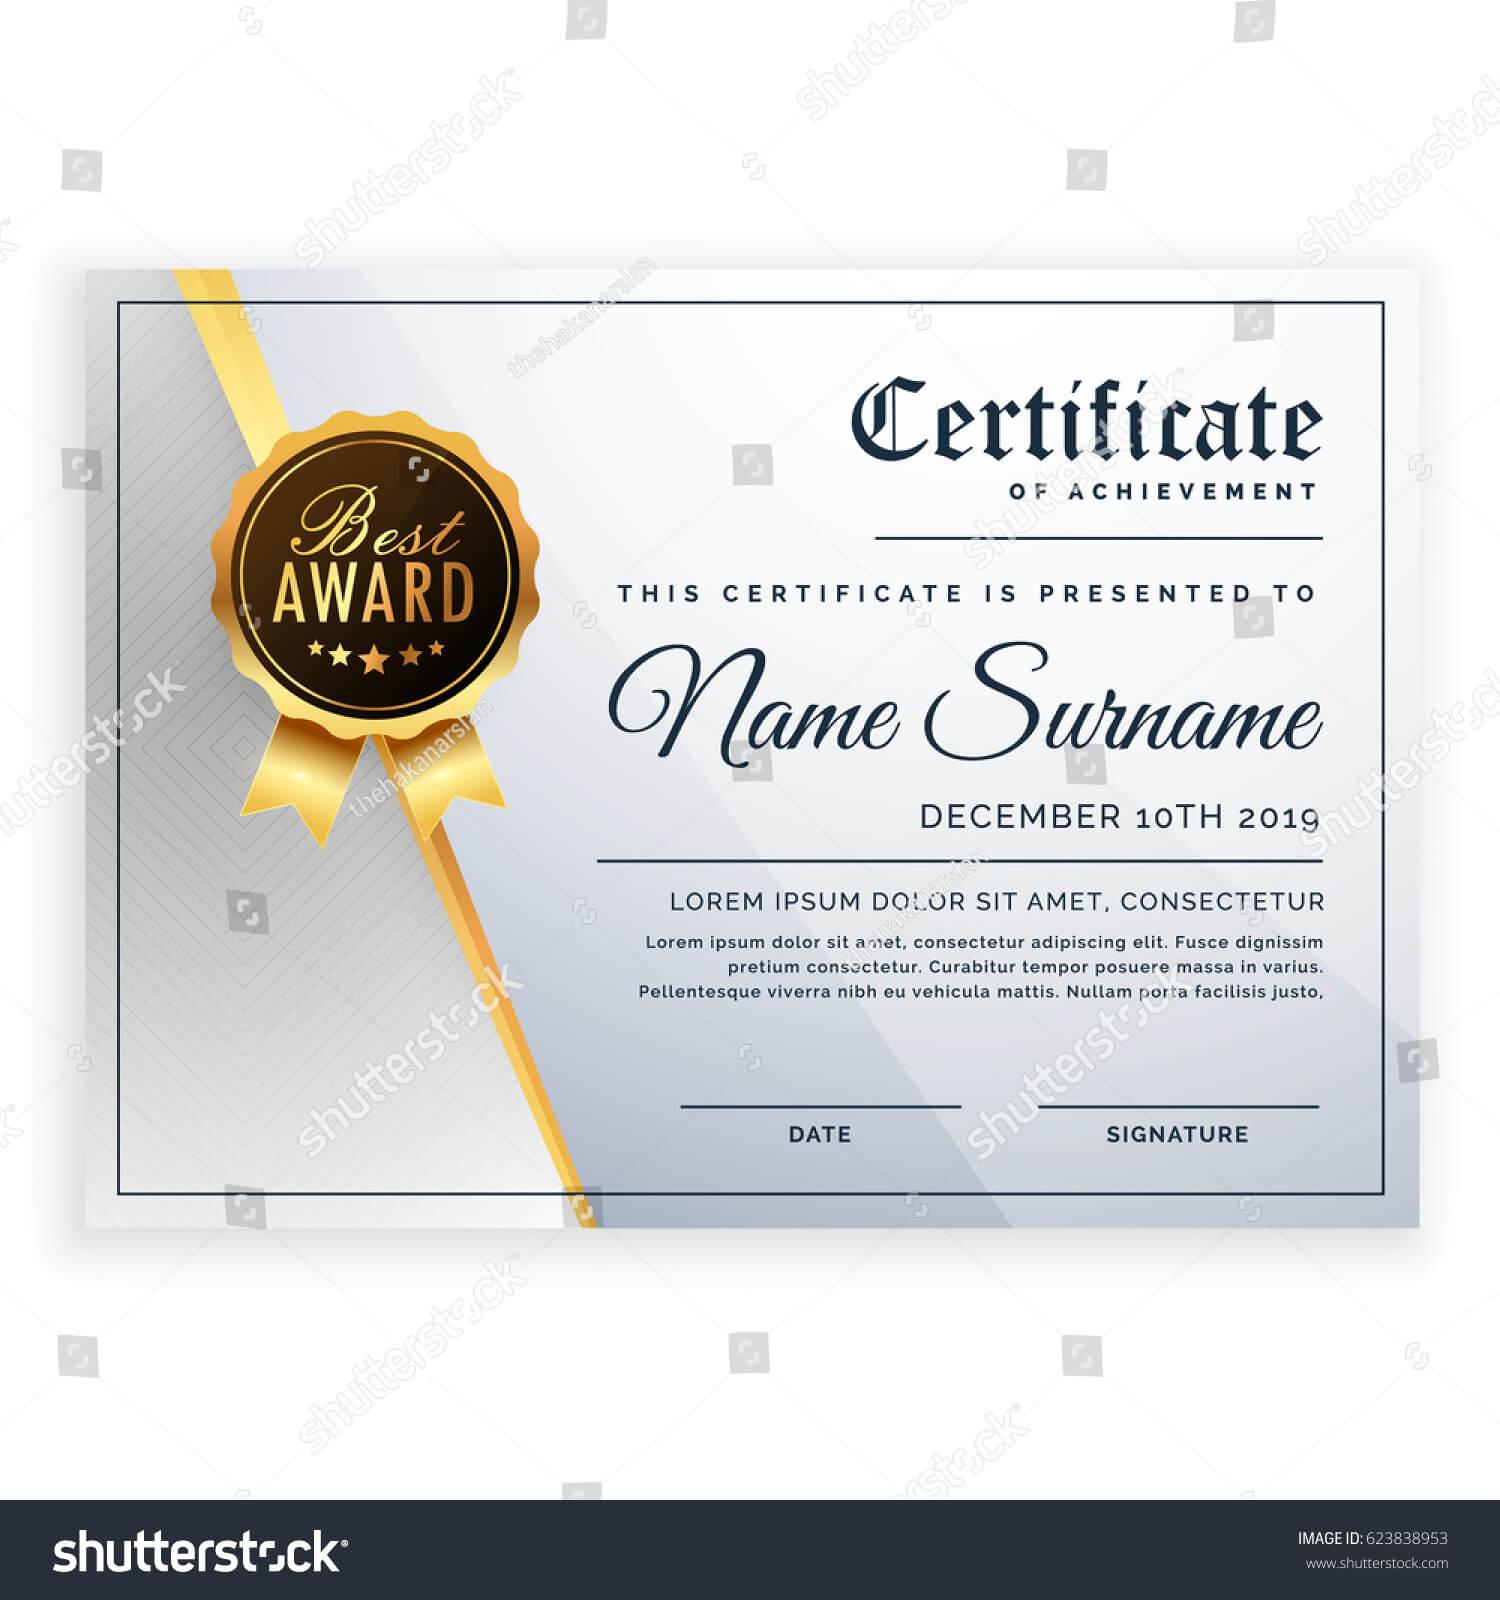 Vector Certificate Template Beautiful Certificate Template Pertaining To Beautiful Certificate Templates